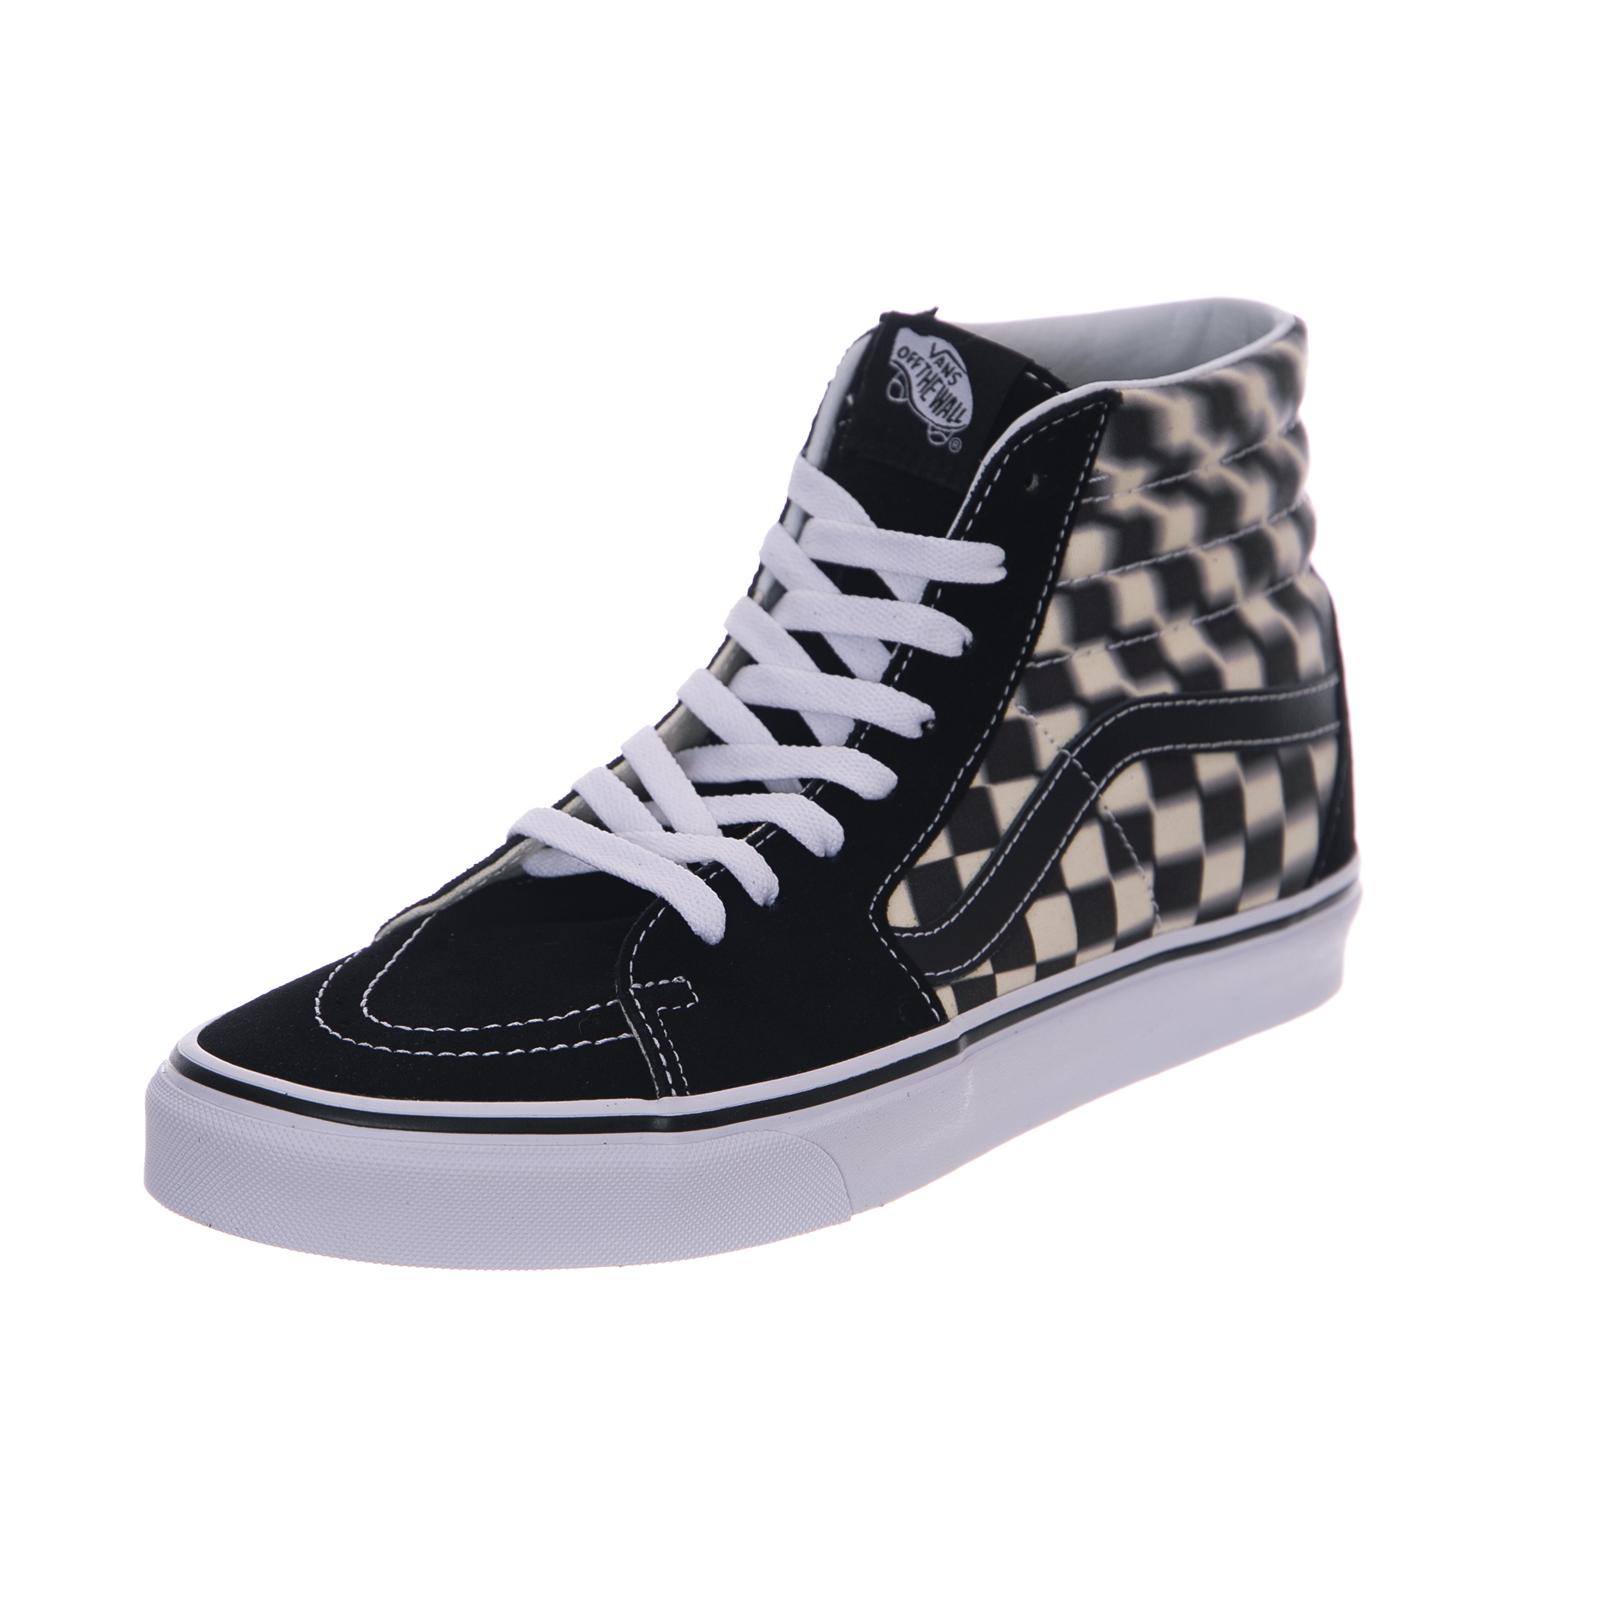 Vans Sneakers Ua sk8 hi Blur Check BlackClassic White Black | eBay